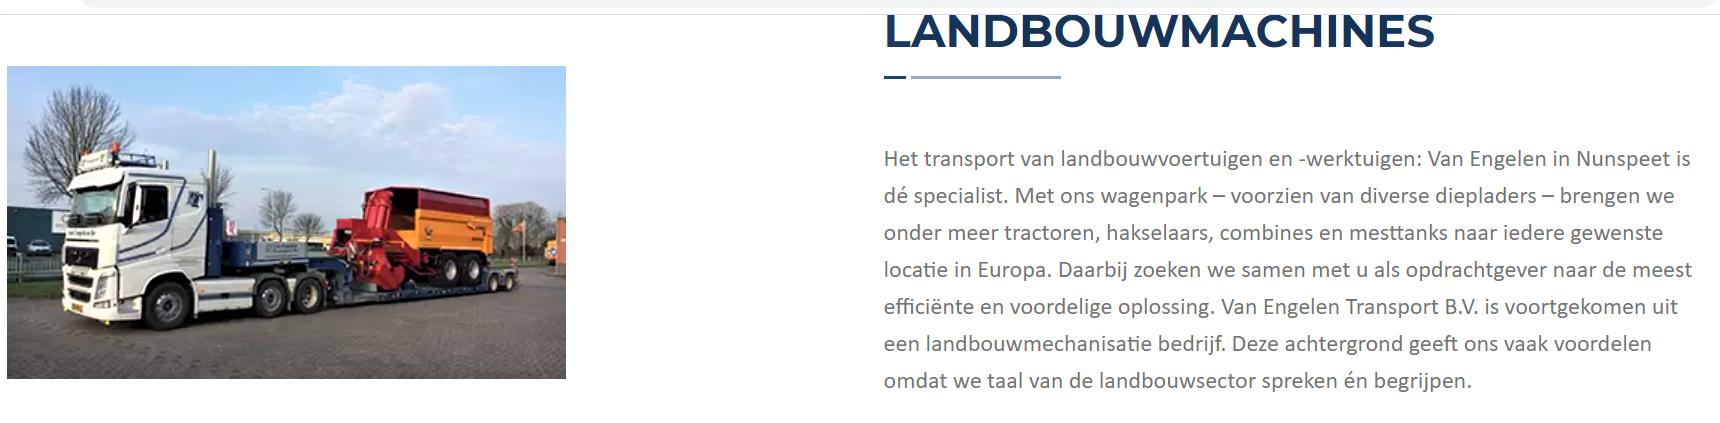 Landbouwmachines-transport-